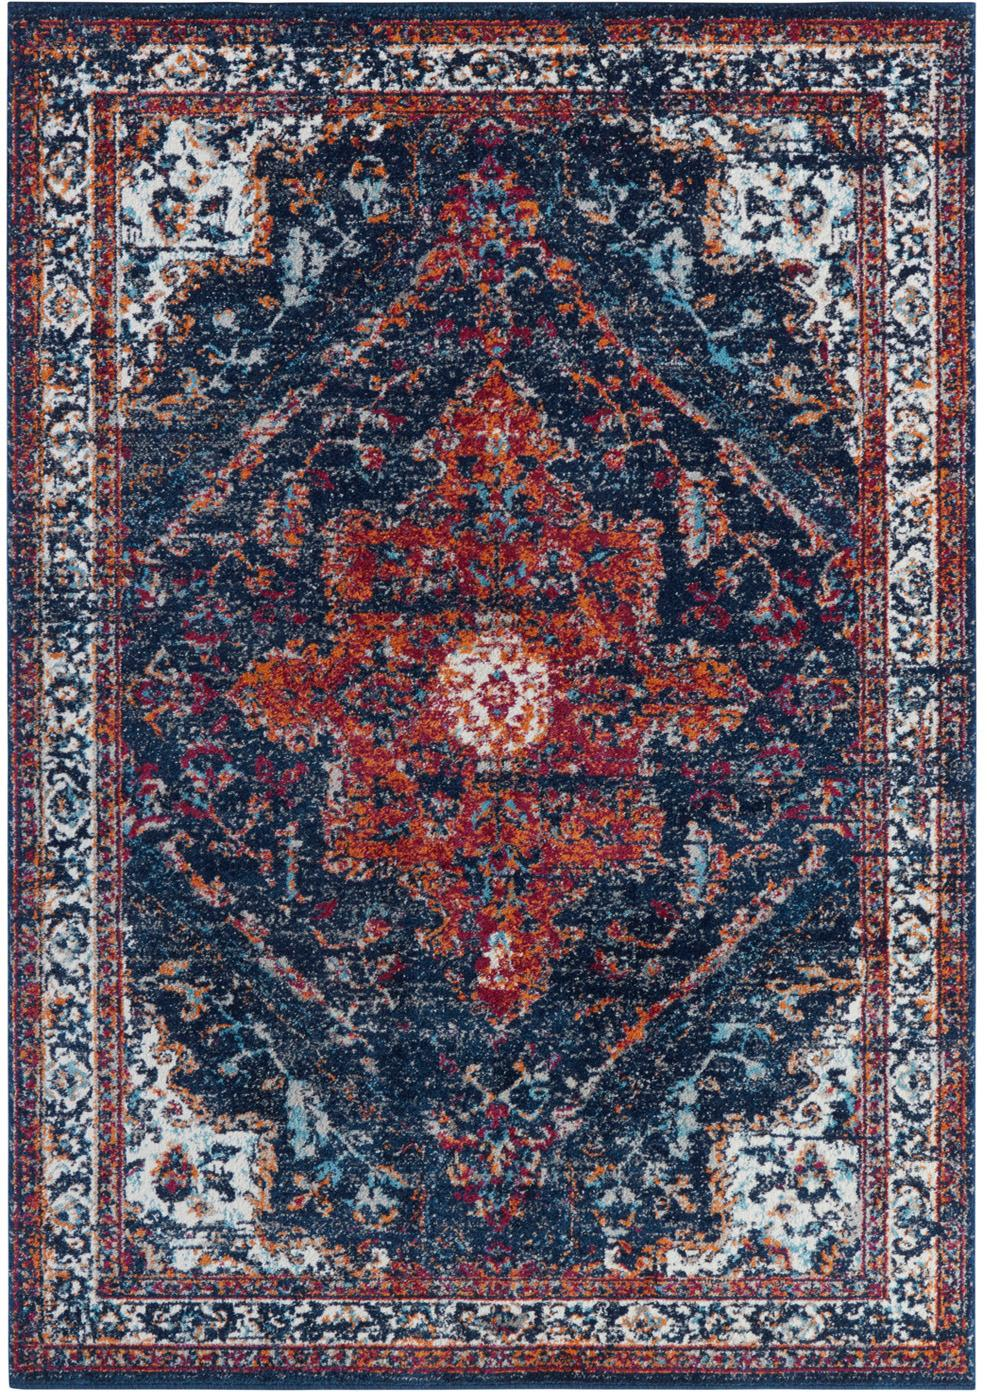 Teppich Azrow im Vintage Style, Flor: 100% Polypropylen, Dunkelblau, Rot, B 120 x L 170 cm (Grösse S)